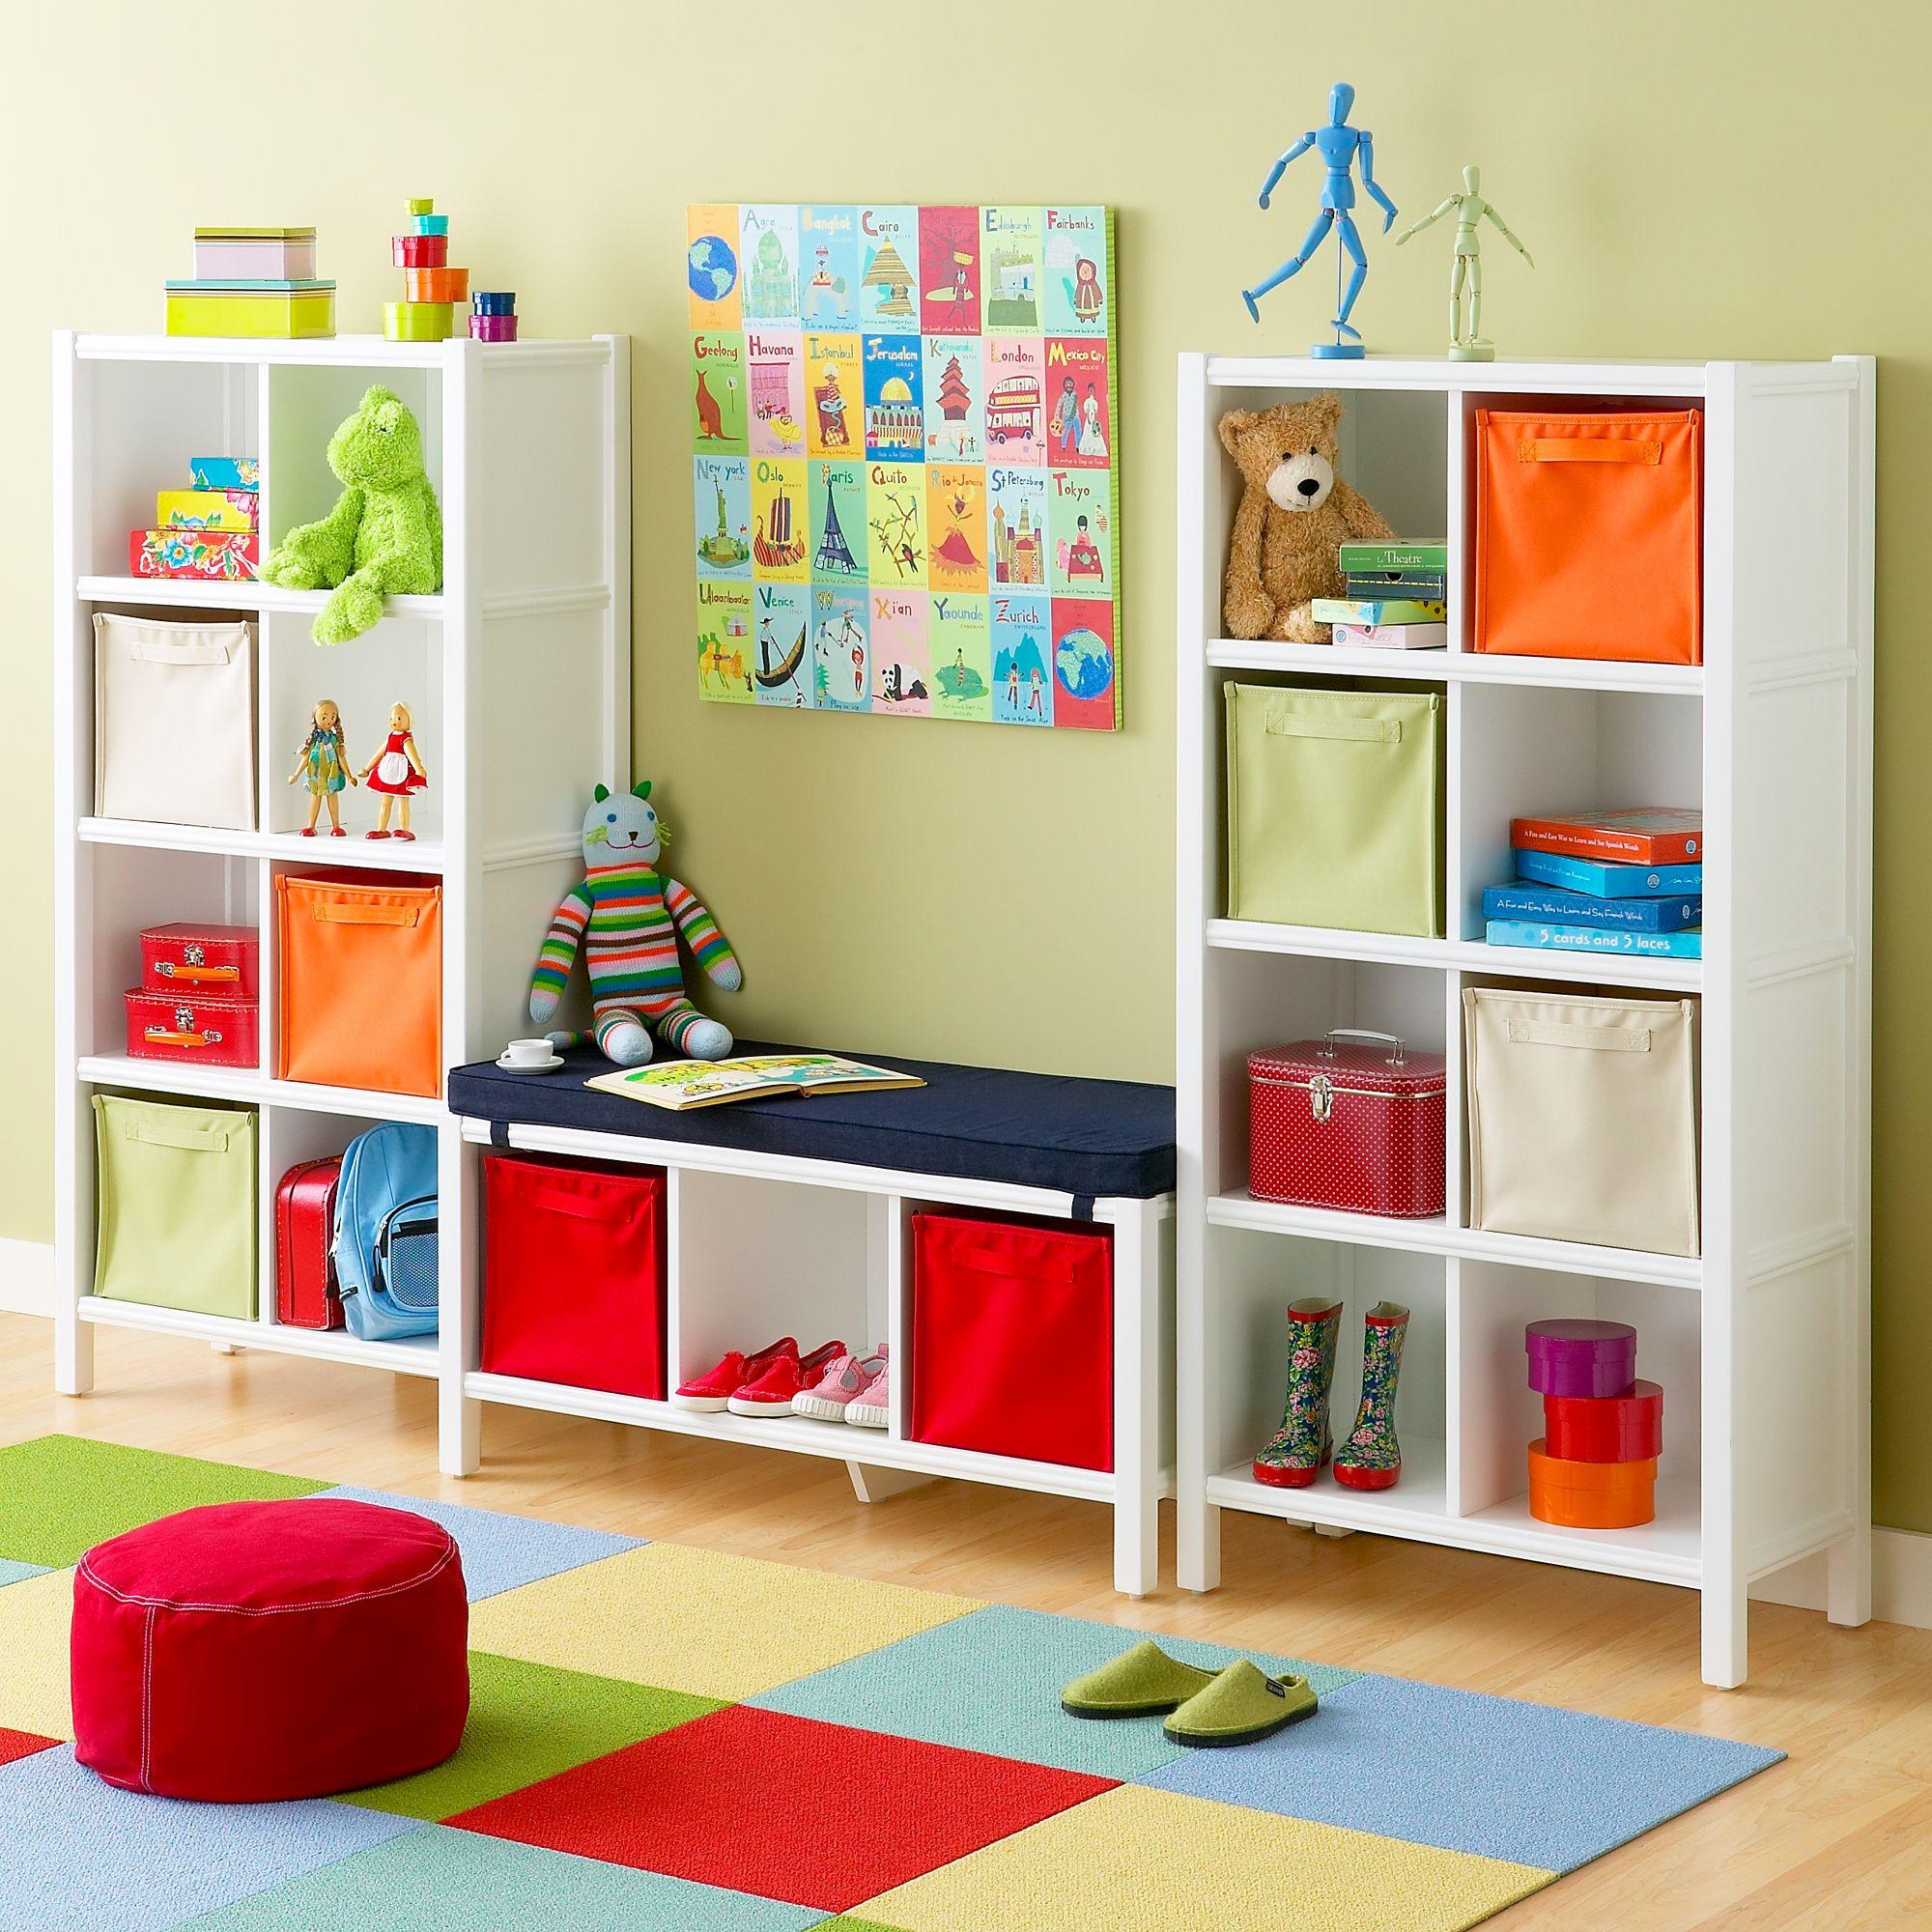 Kids Bedroom Storage  25 Exceptional Toddler Boy Room Ideas SloDive